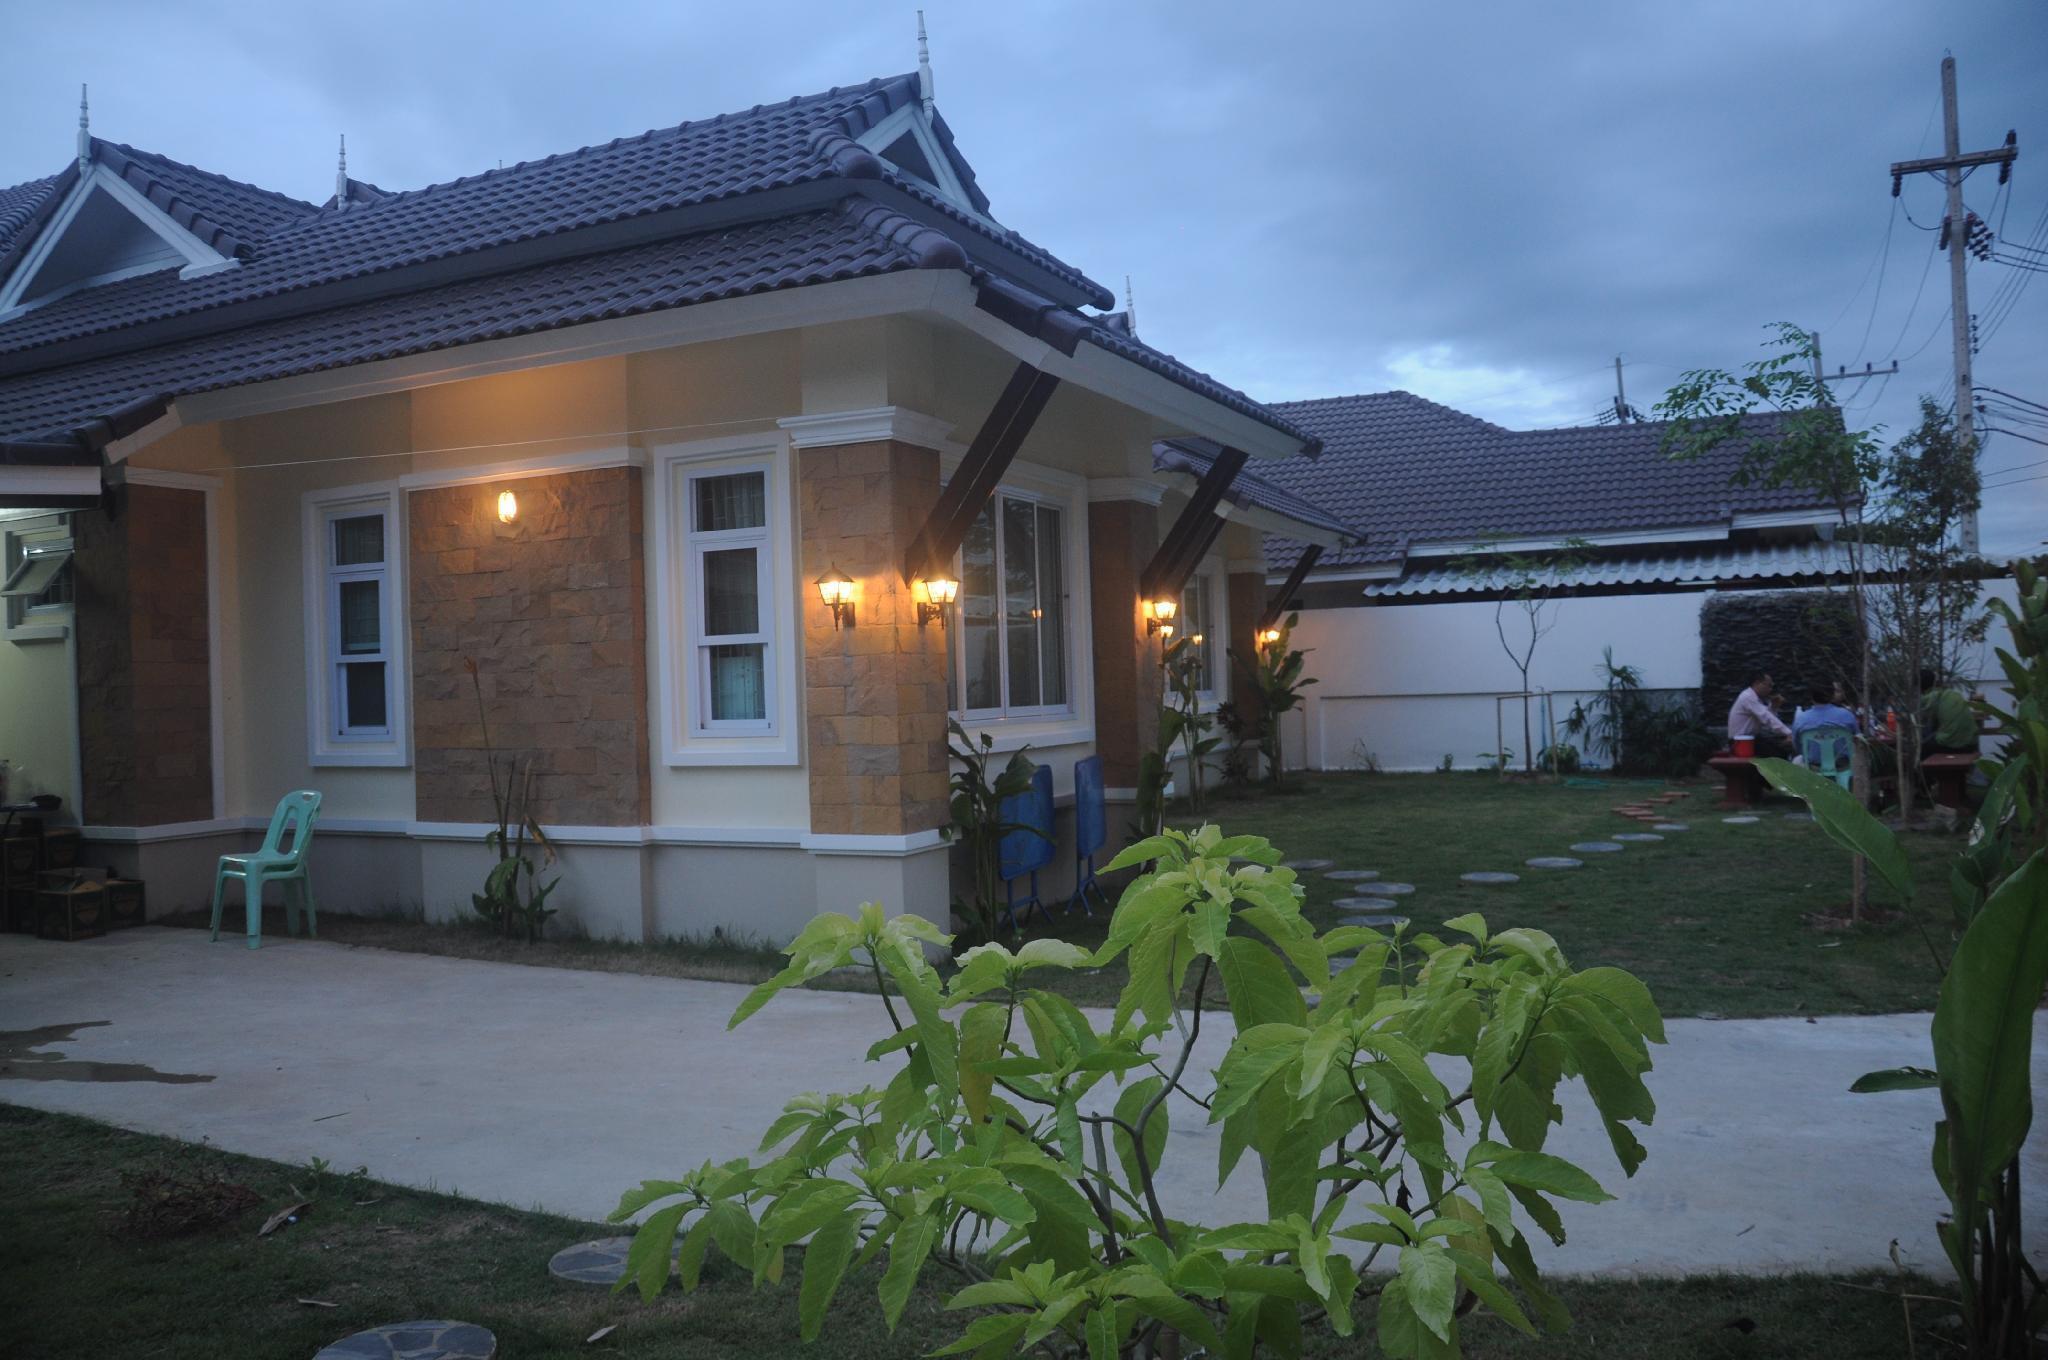 Baan imoun@Usaran2 Chiang Mai บ้านเดี่ยว 3 ห้องนอน 2 ห้องน้ำส่วนตัว ขนาด 120 ตร.ม. – แม่โจ้